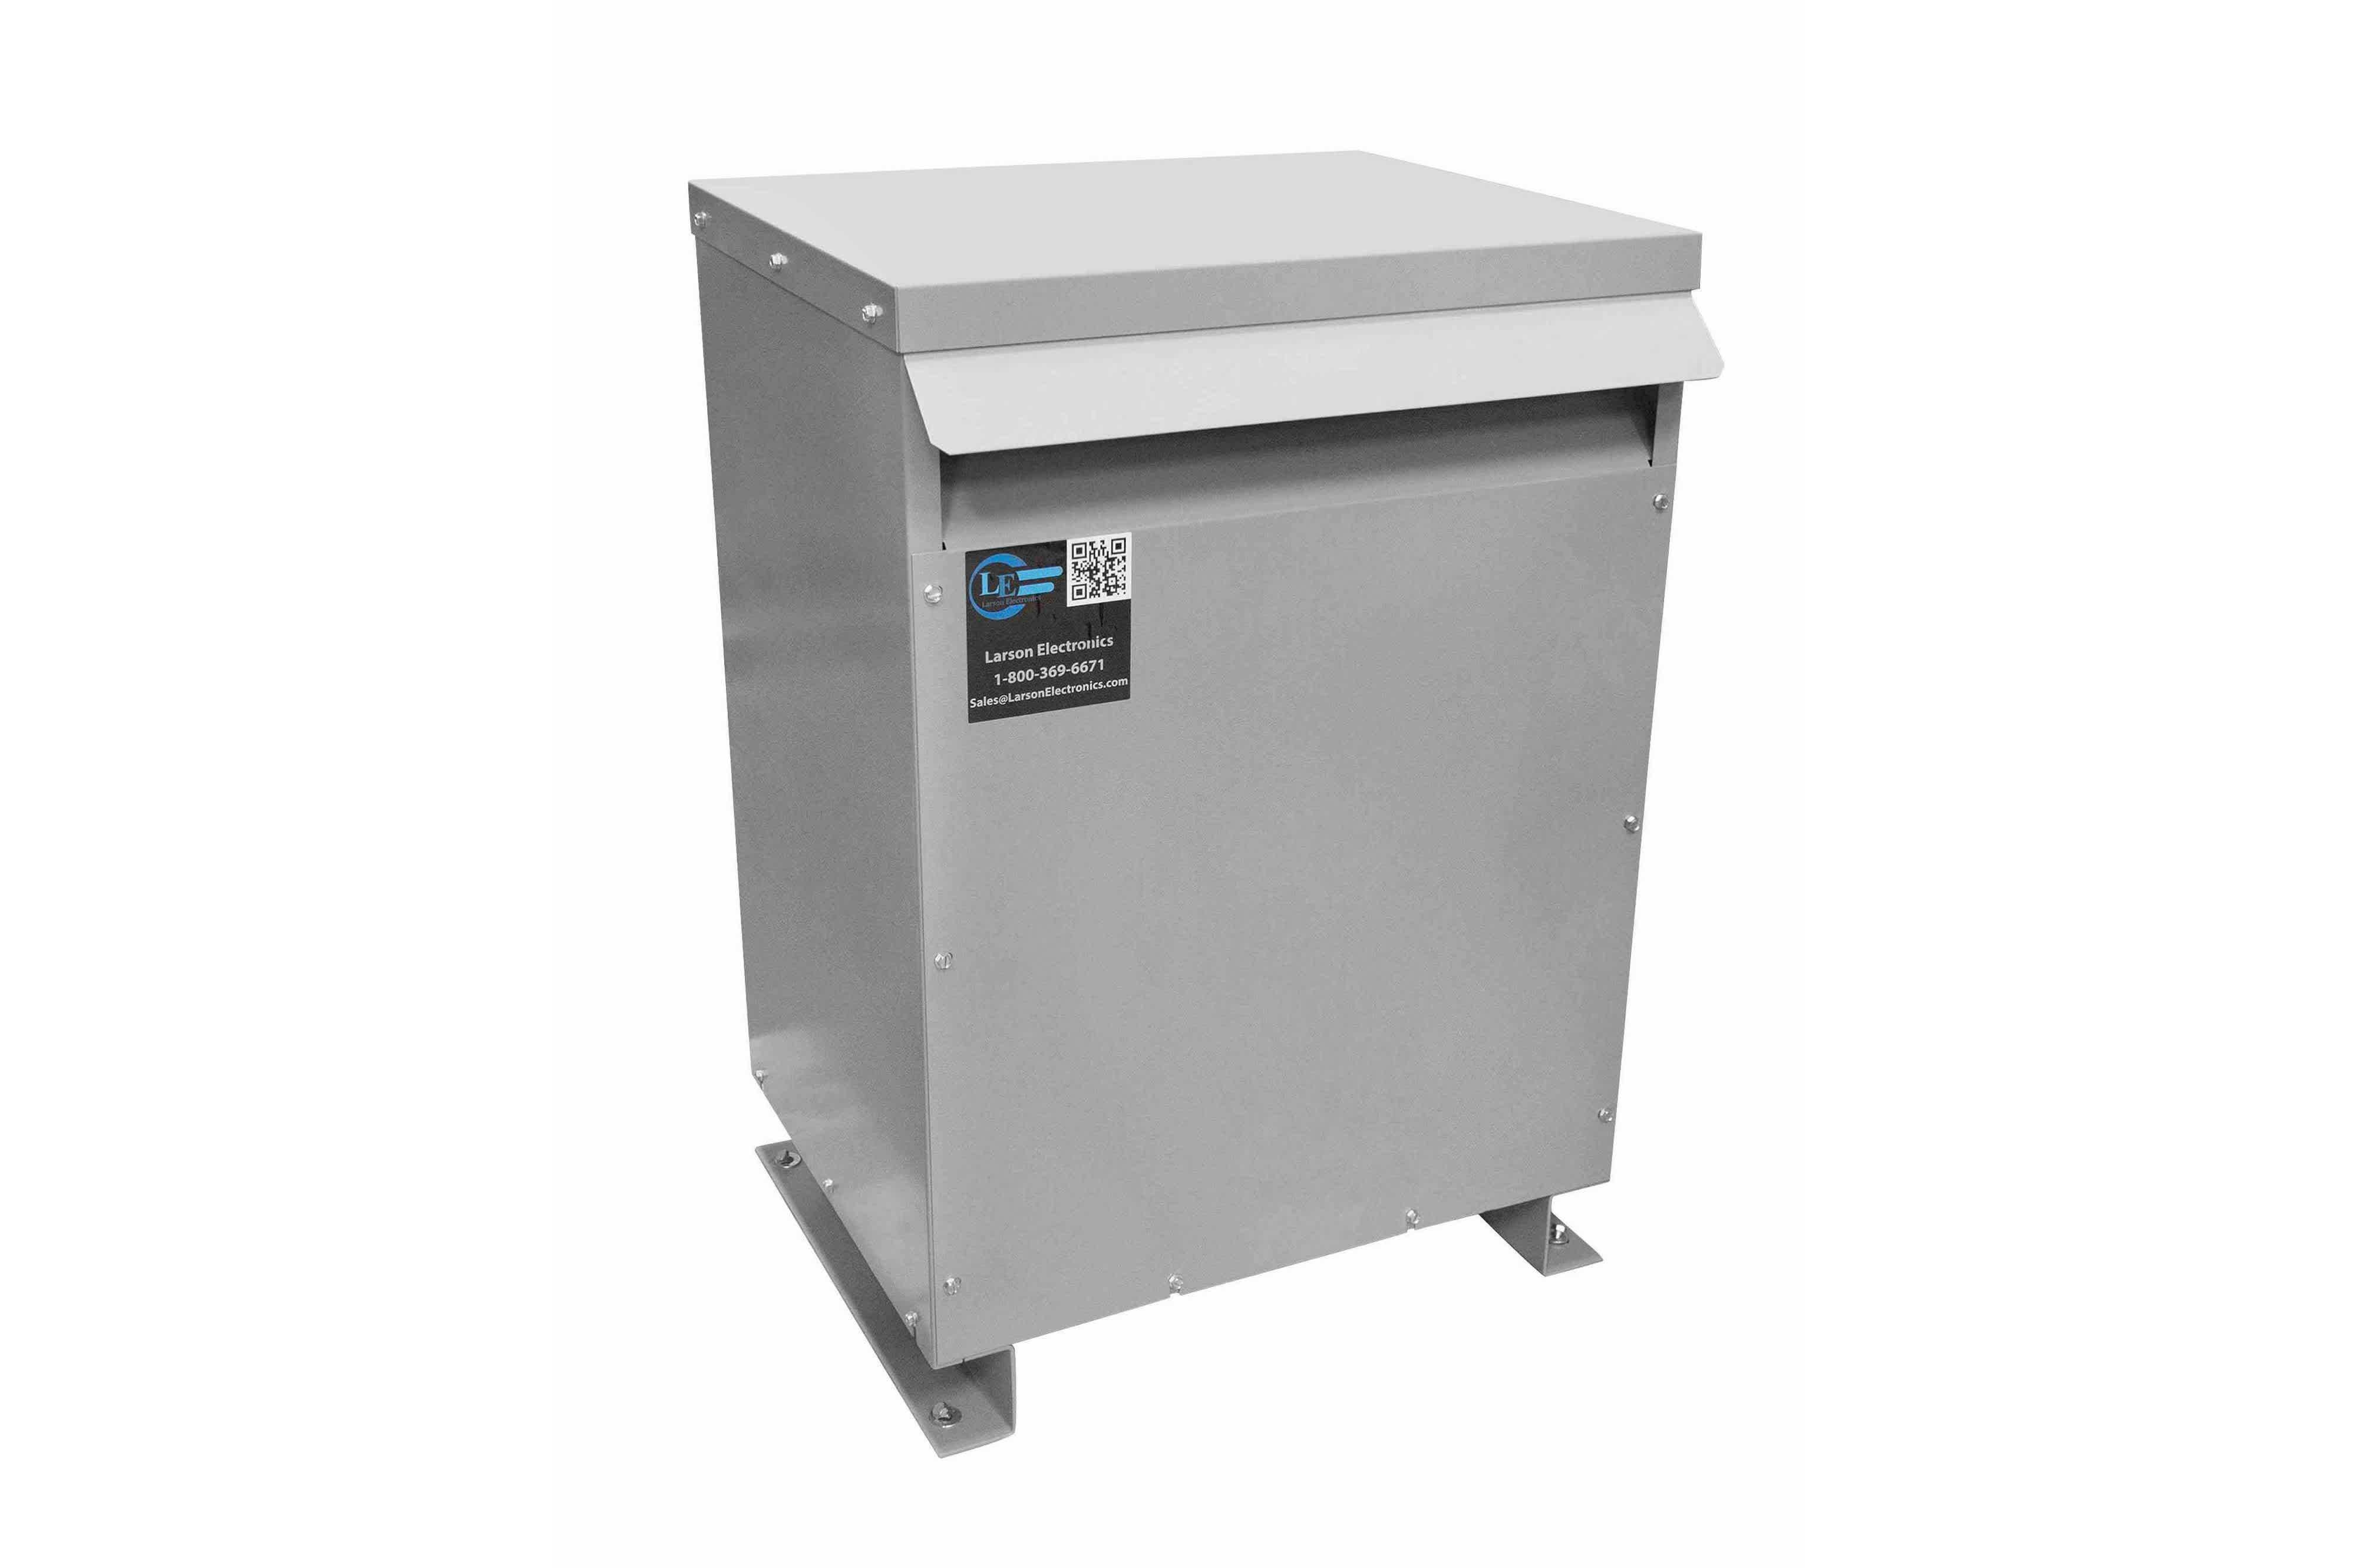 112.5 kVA 3PH DOE Transformer, 240V Delta Primary, 380Y/220 Wye-N Secondary, N3R, Ventilated, 60 Hz